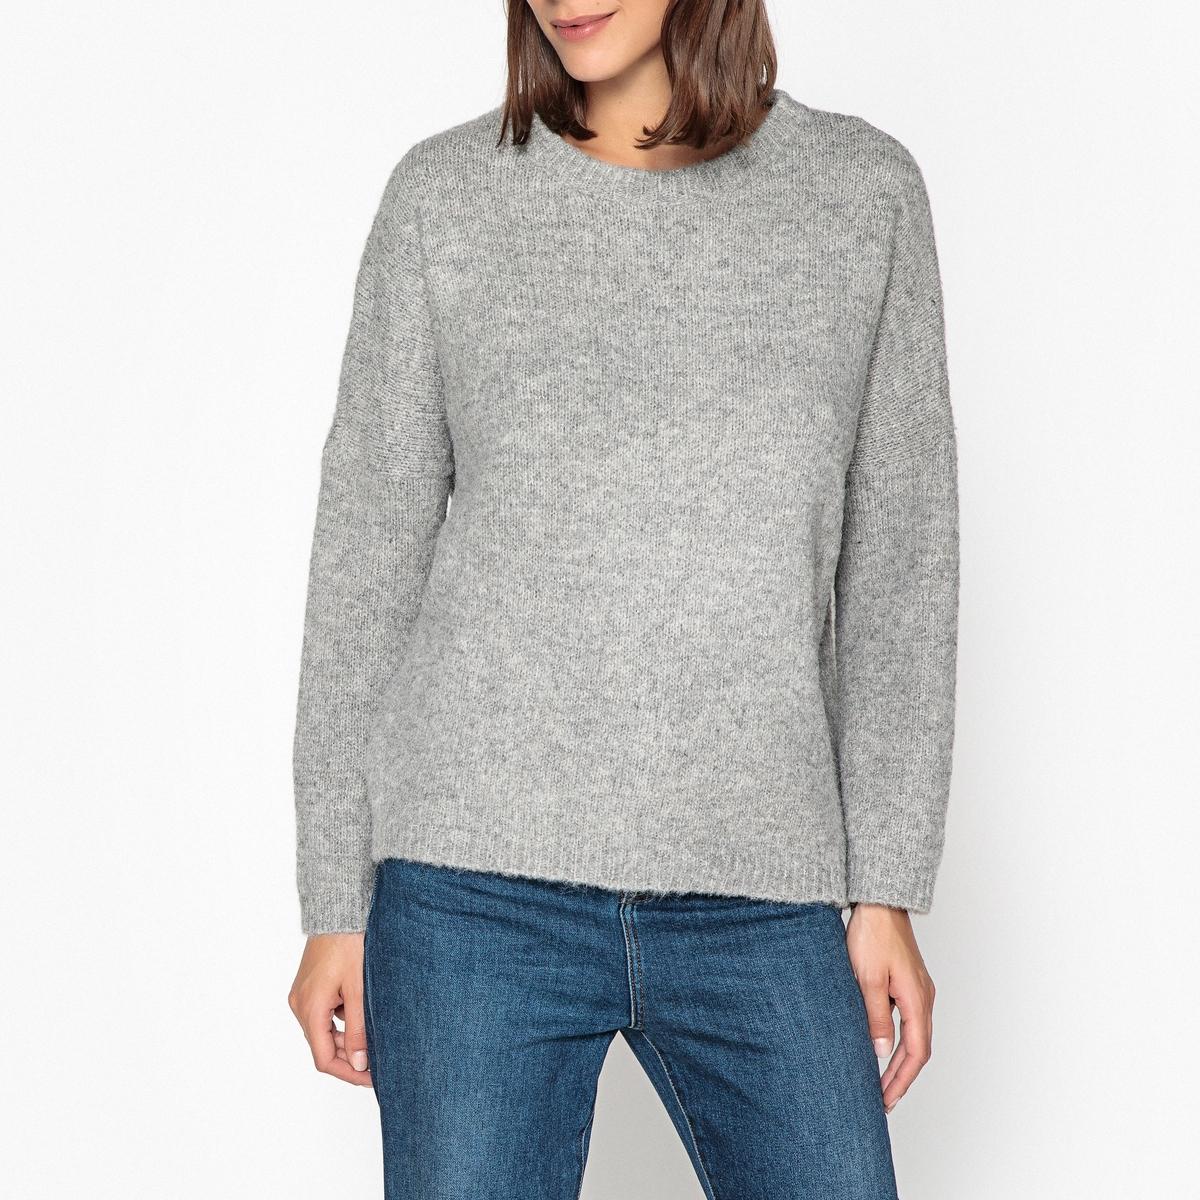 Пуловер GARANCE PARIS 12165257 от LaRedoute